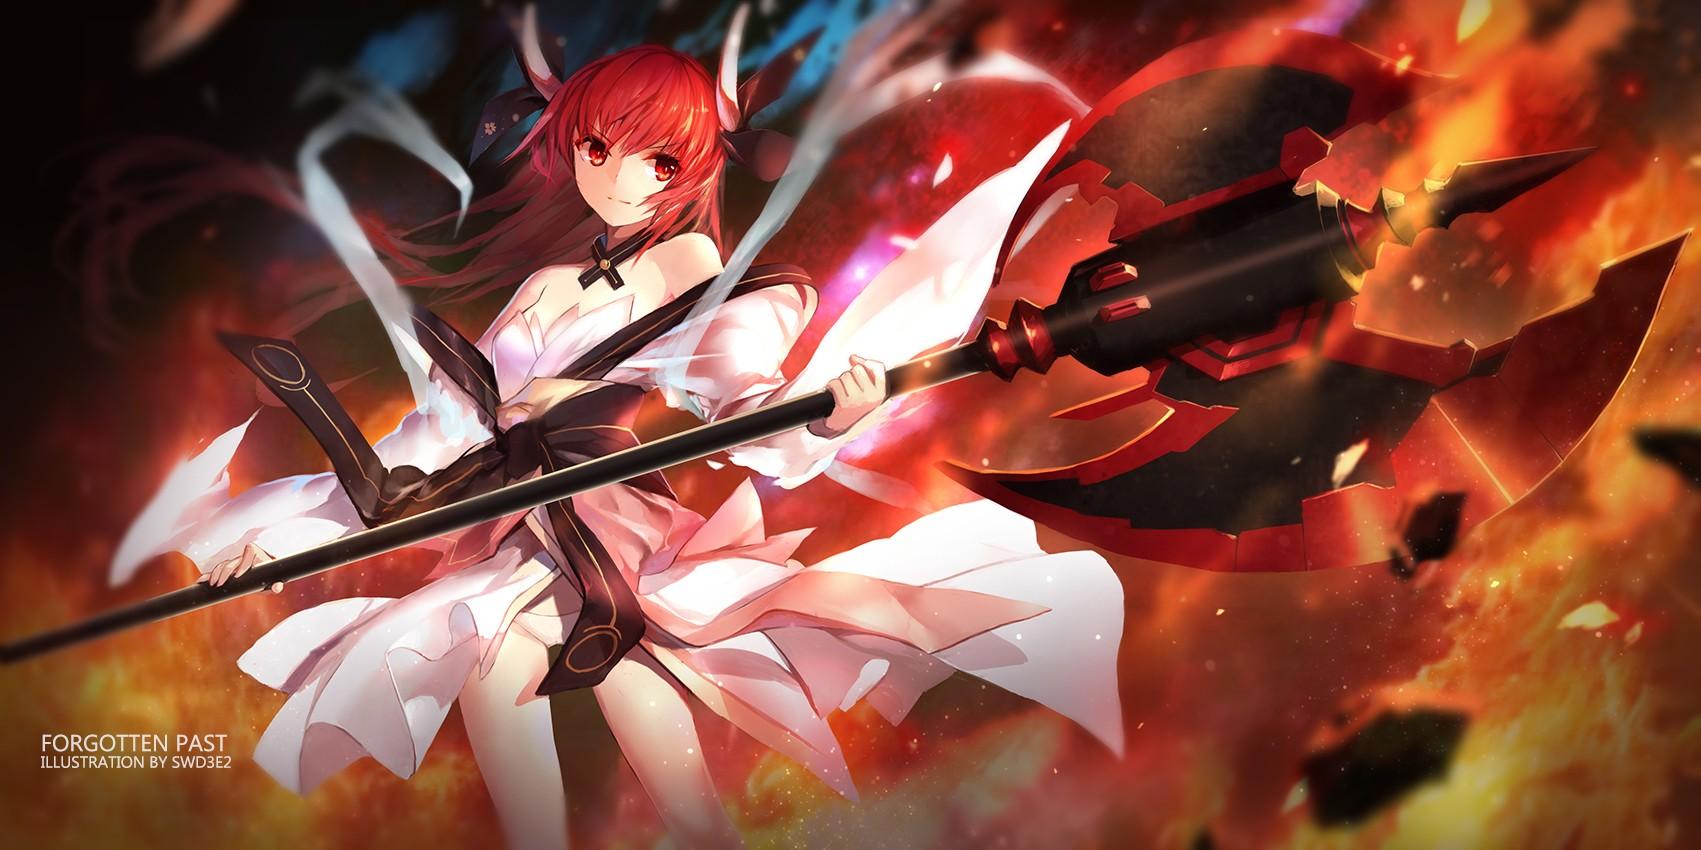 Anime Girls Date A Live Red Fire Itsuka Kotori Swd3e2 Flower Flame Screenshot Computer Wallpaper